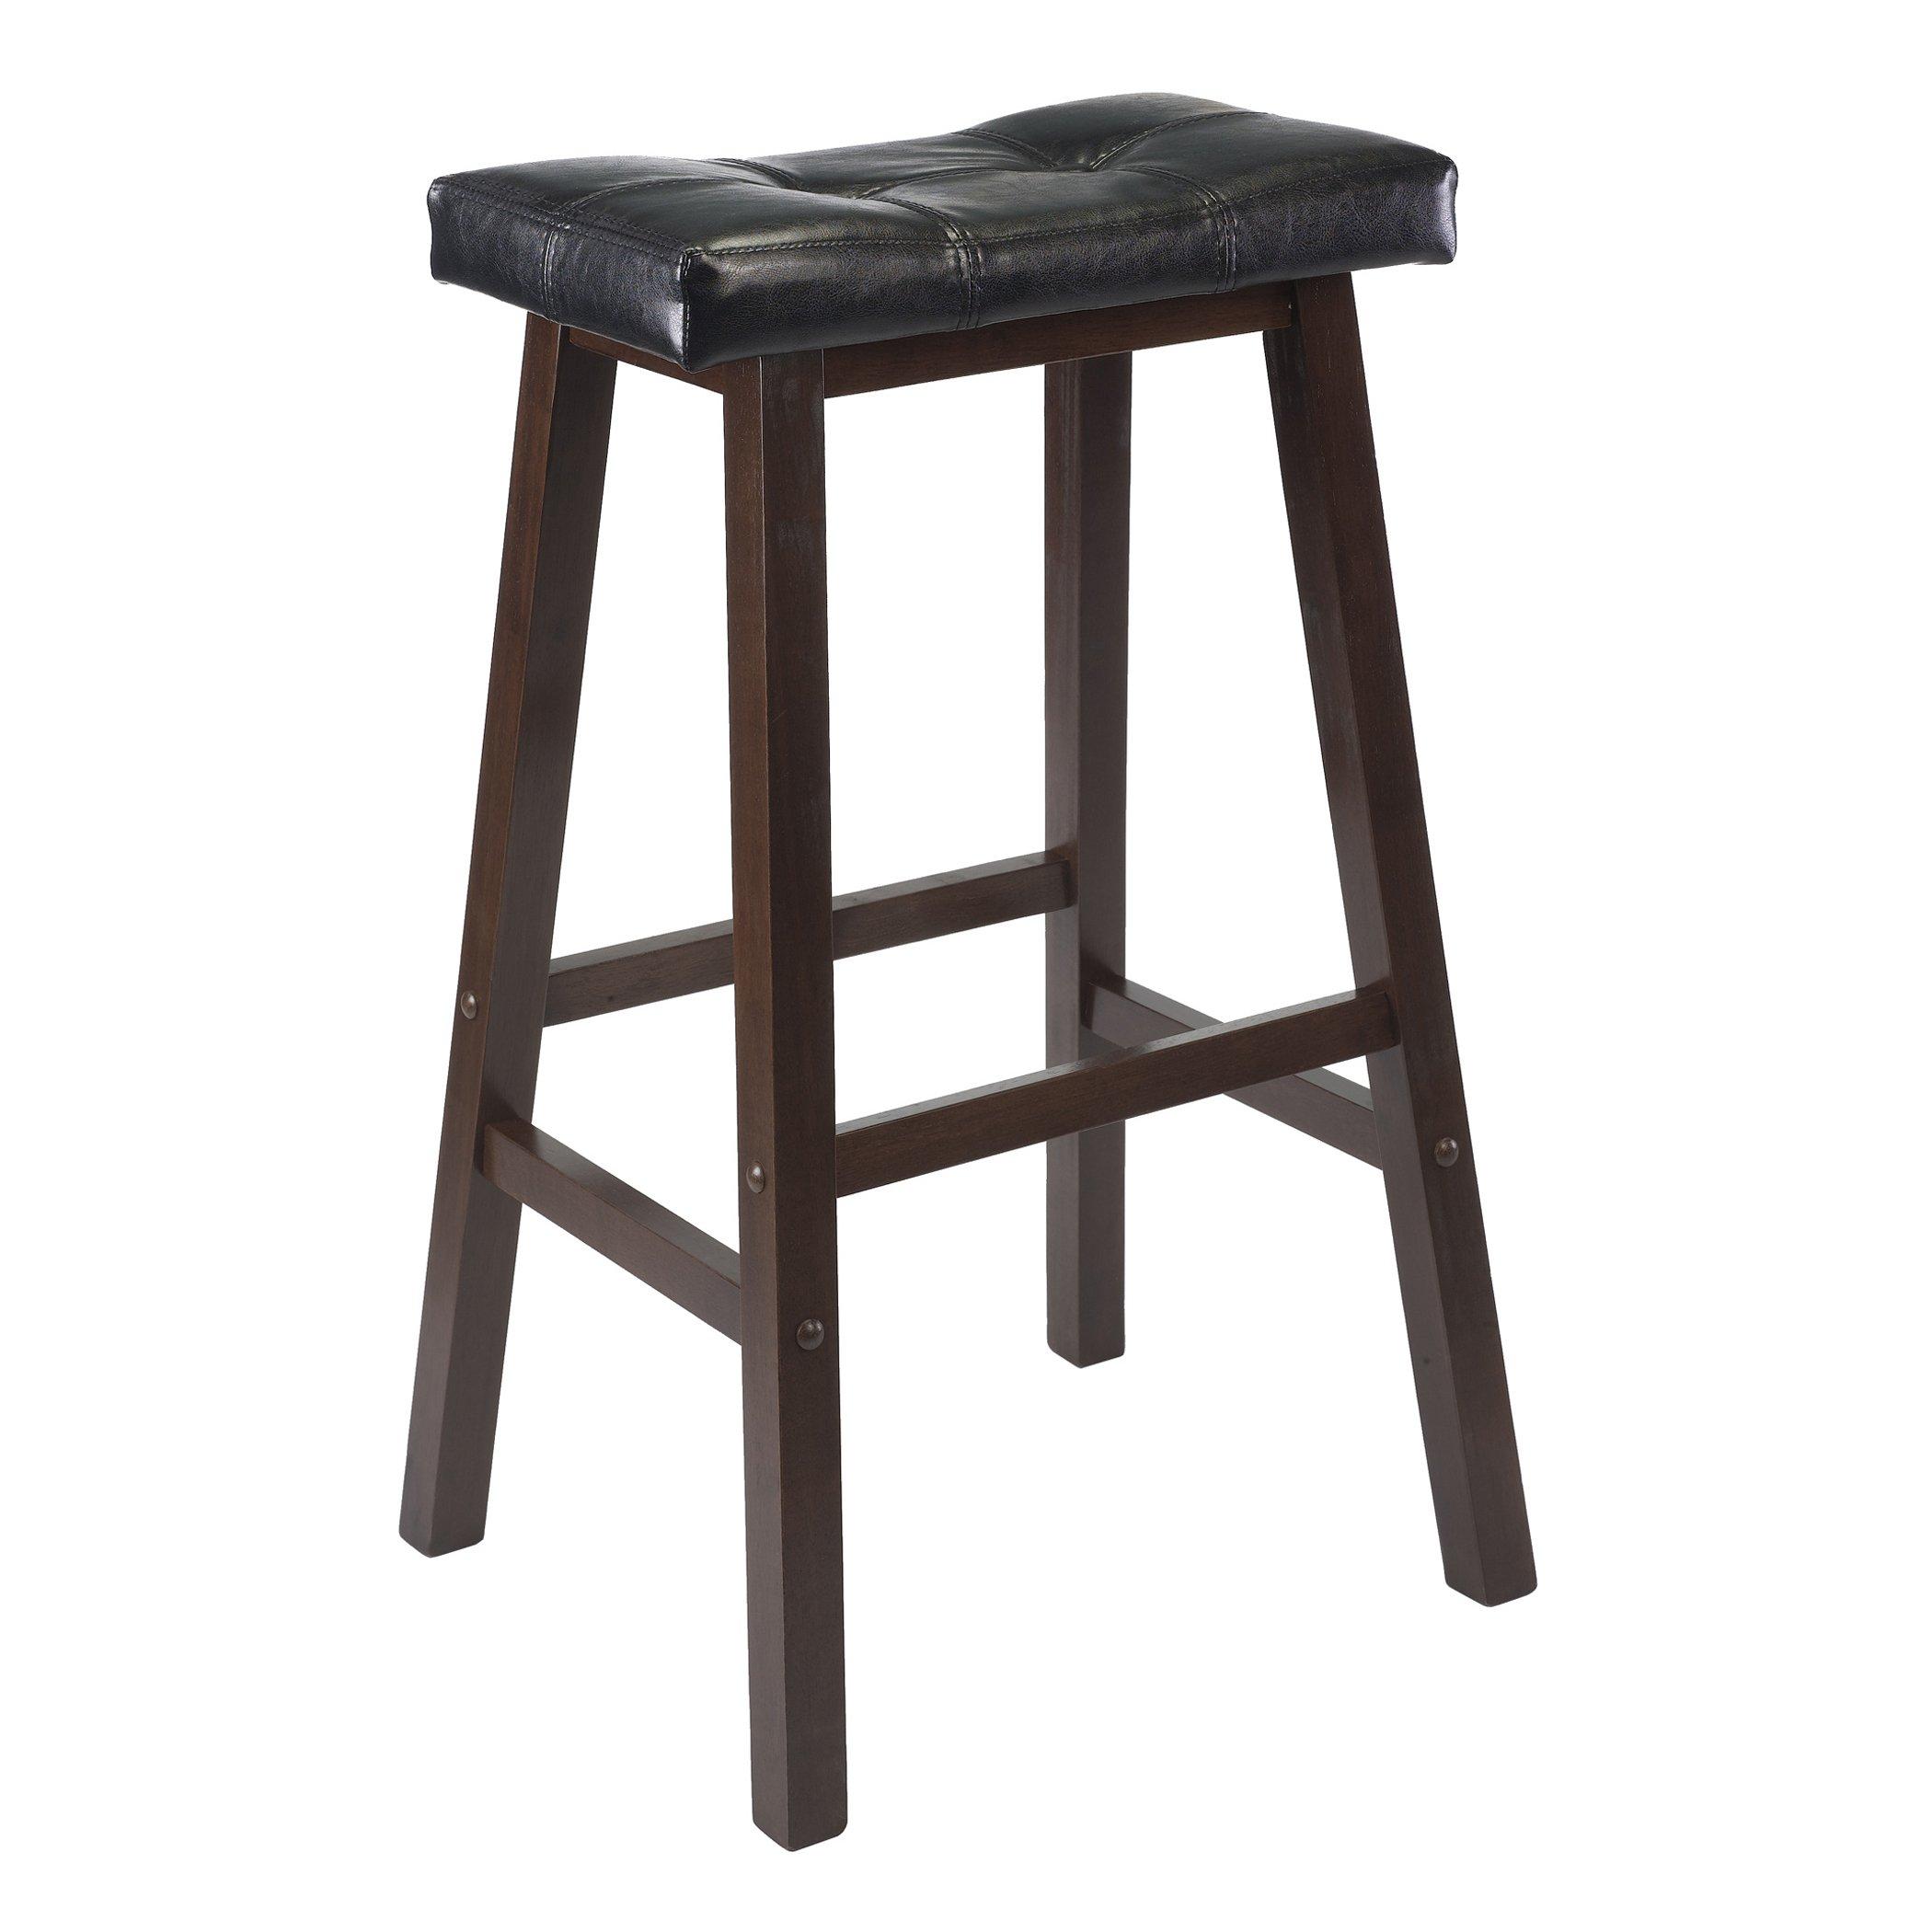 Winsome Mona 29-Inch Cushion Saddle Seat Stool, Black, Faux Leather, RTA